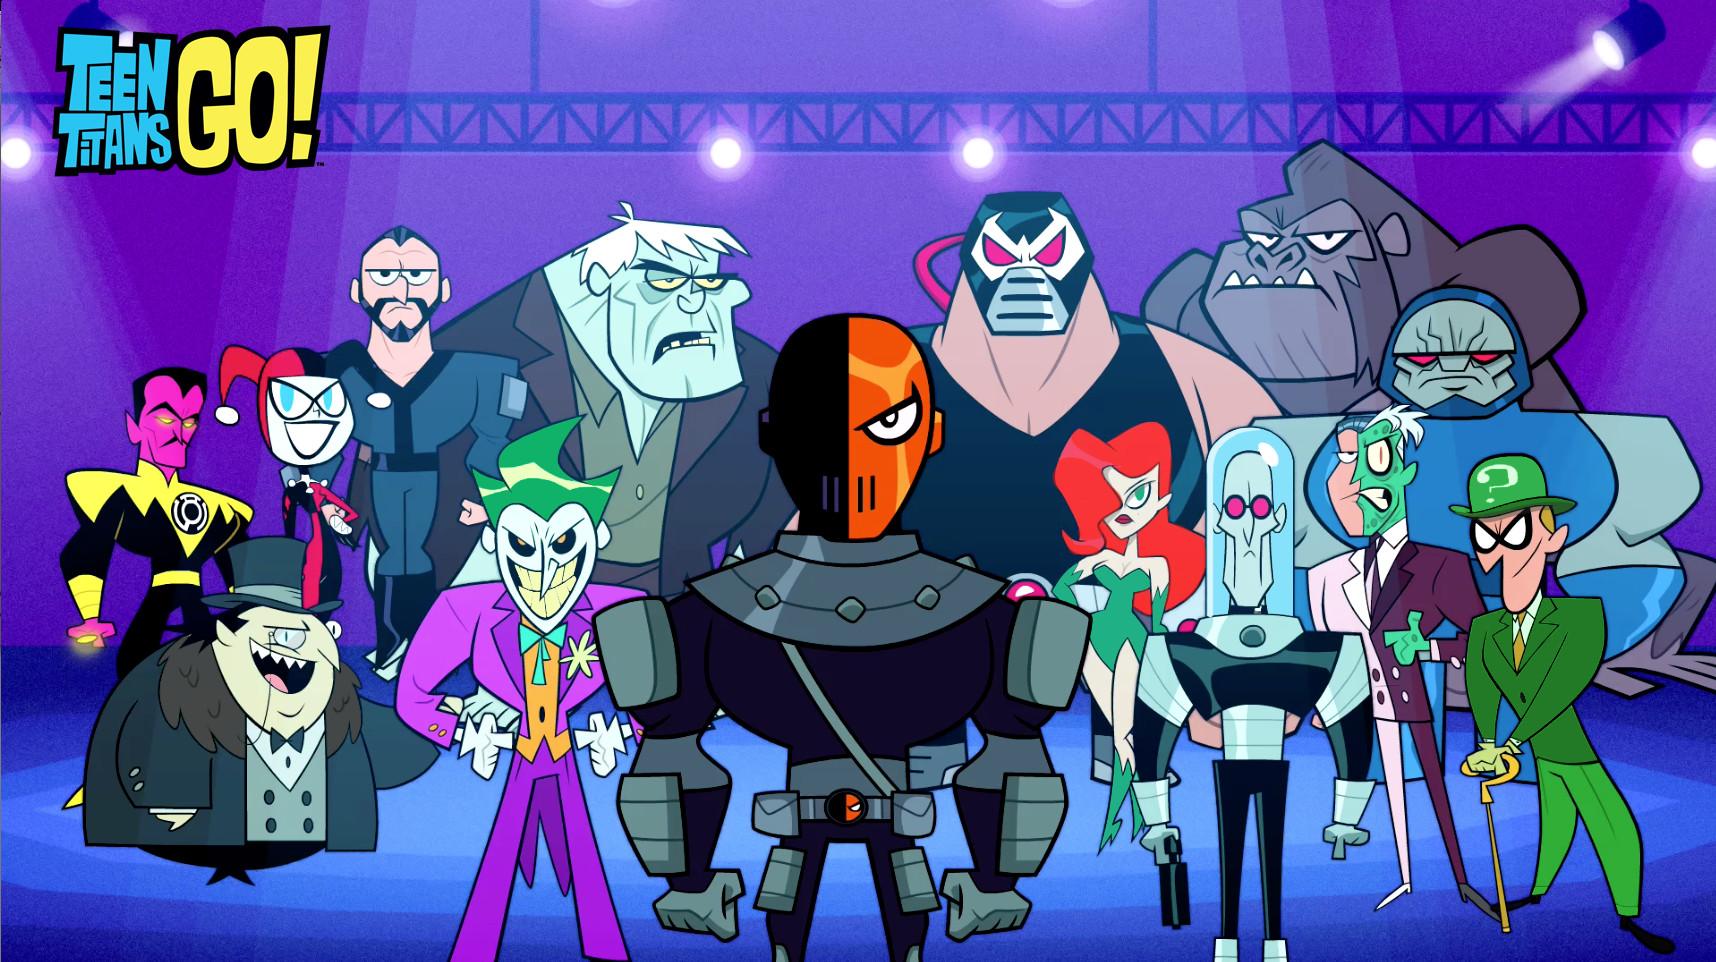 Artstation - Dc Villains Screenshot - Teen Titans Go -5664